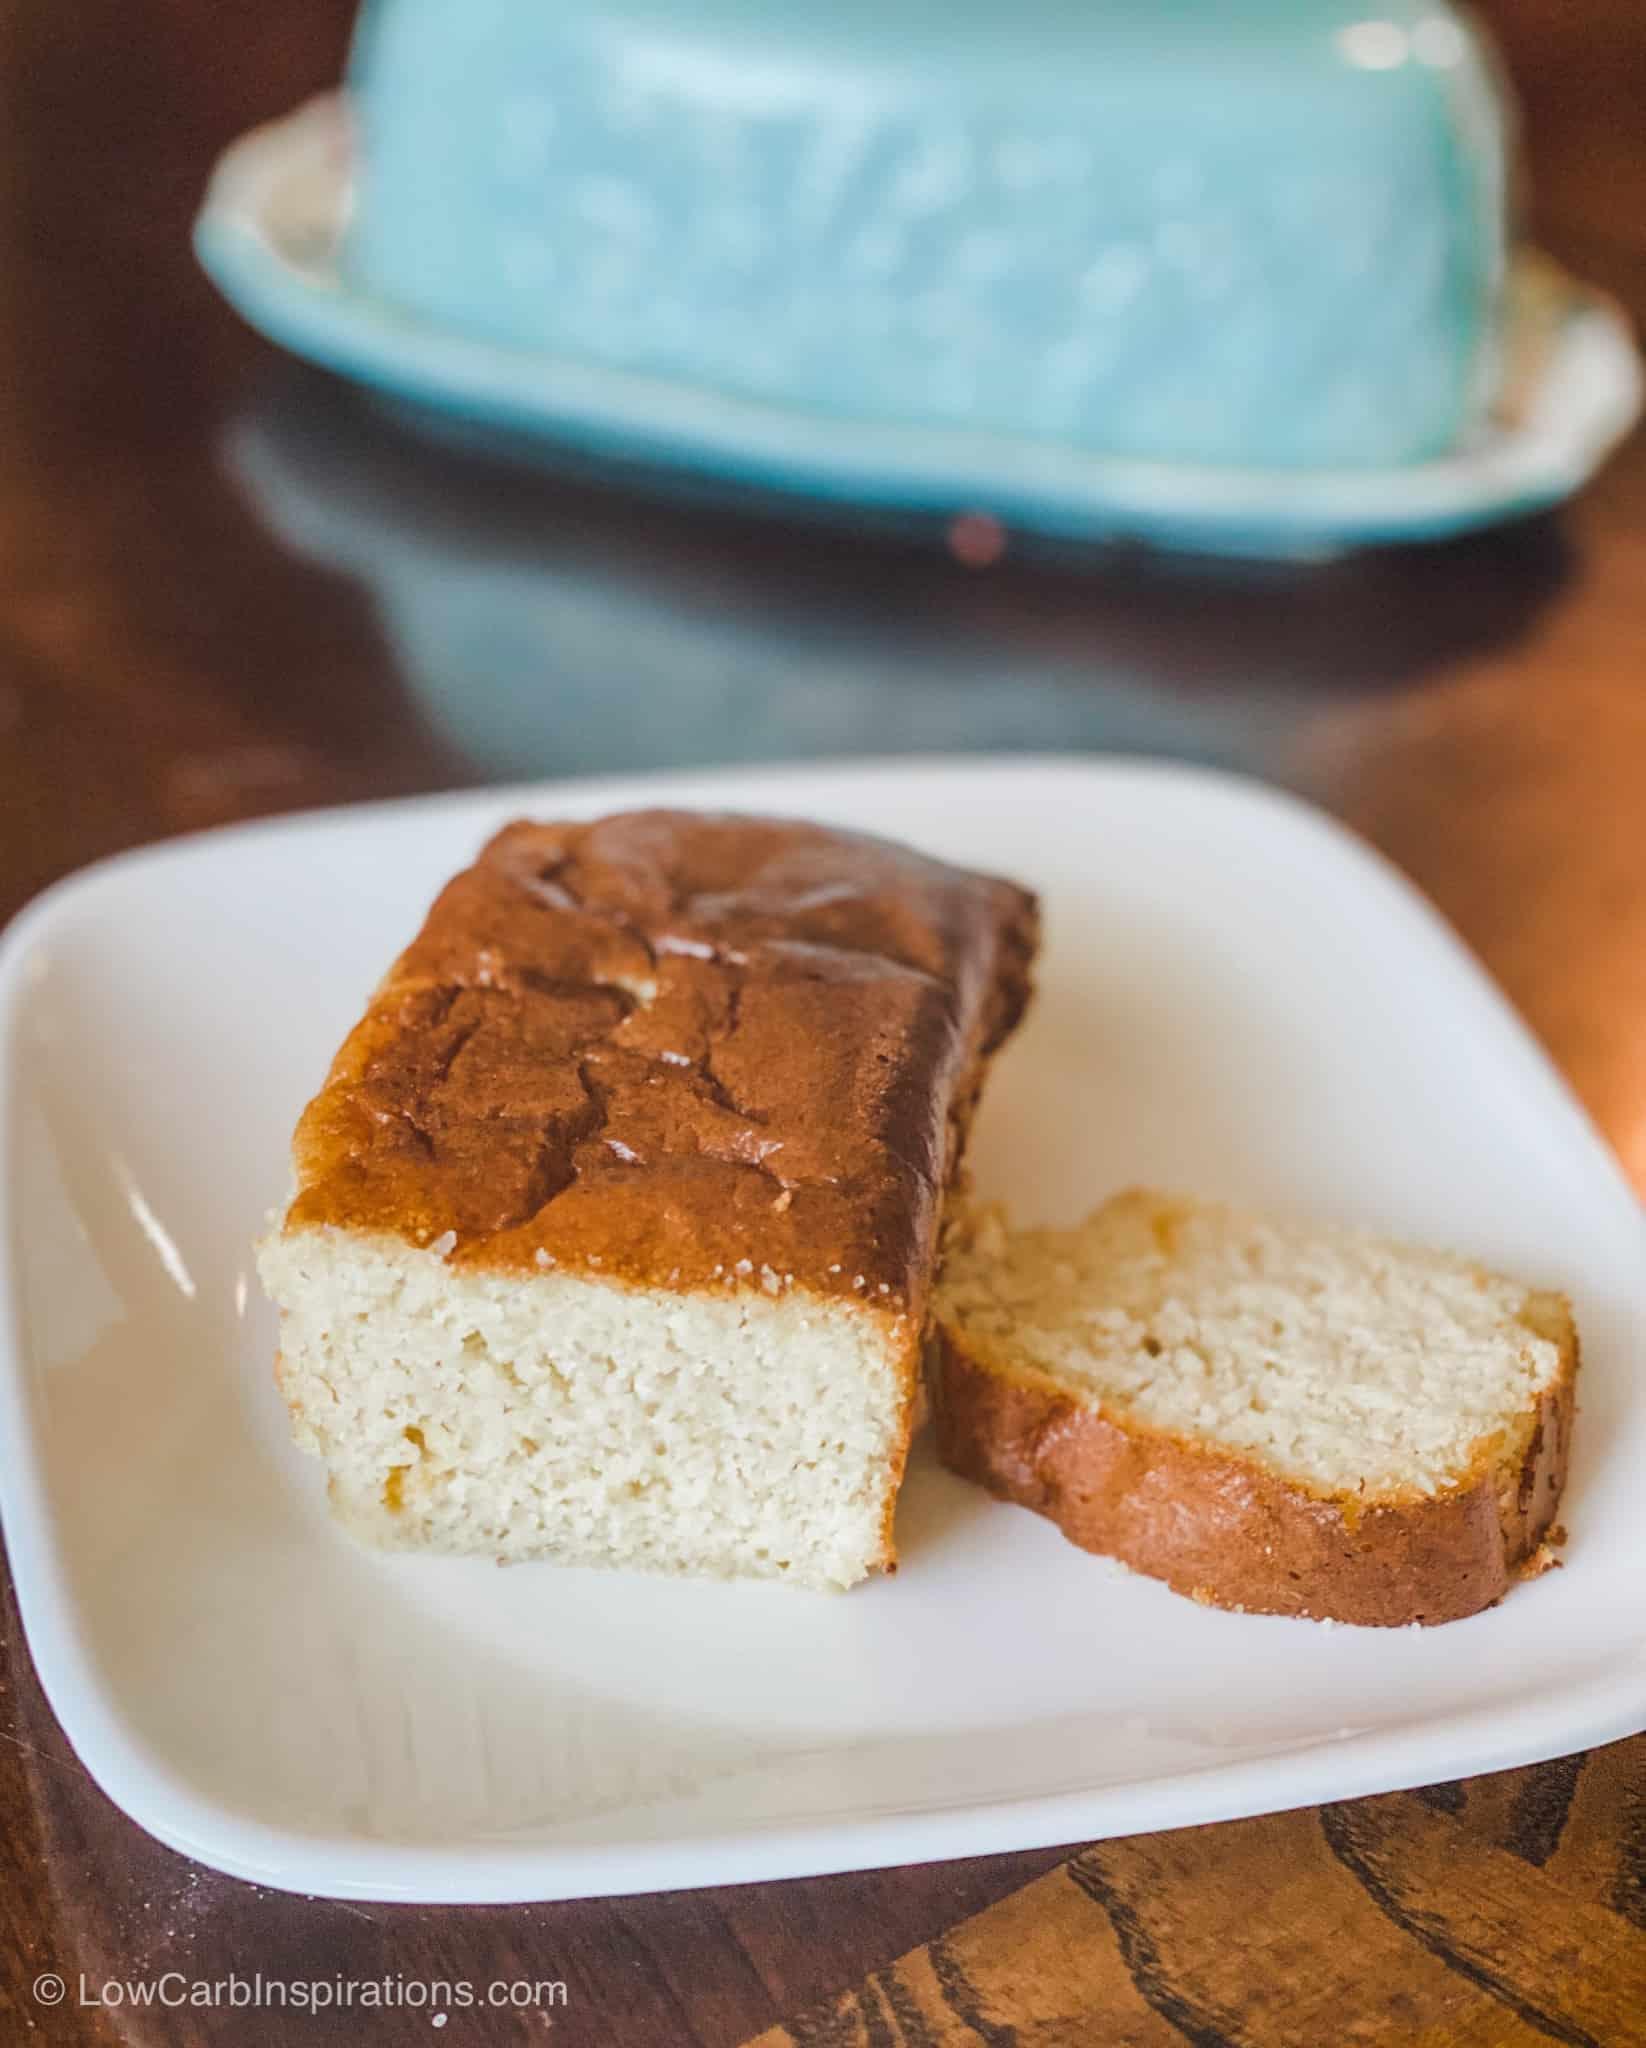 Keto Melted Ice Cream Cake (Sweet Bread)